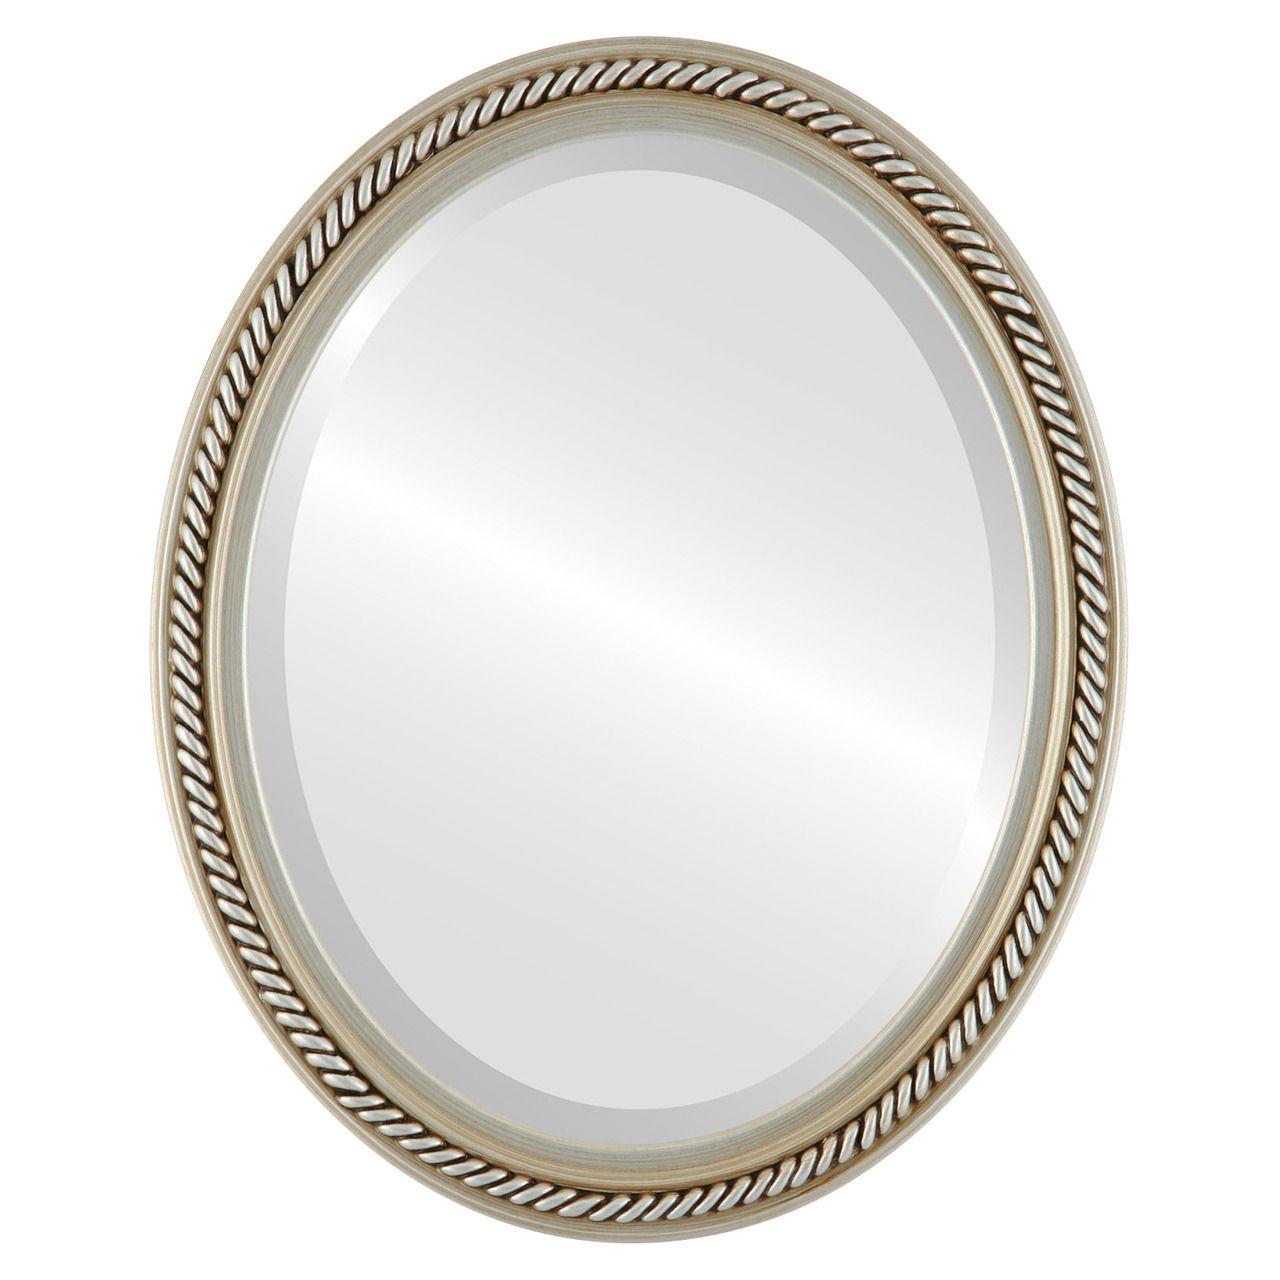 Beveled Mirror - Santa Fe Oval Frame - Silver | Oval framed mirrors ...